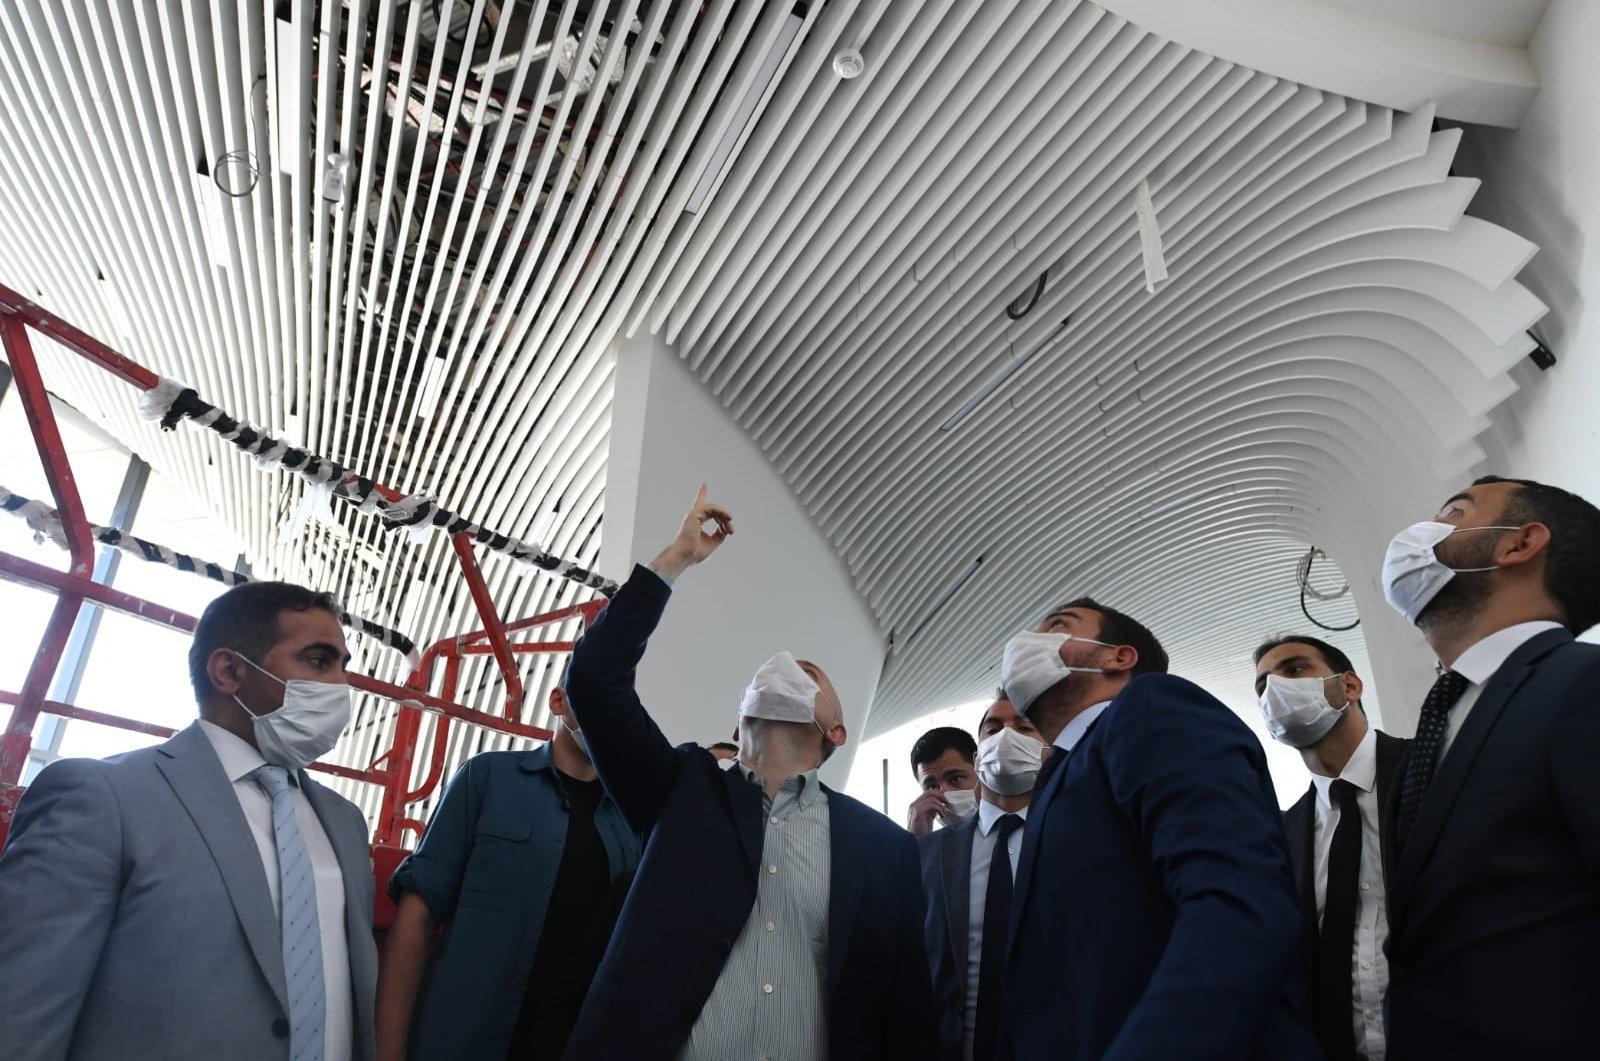 Transport and Infrastructure Minister Adil Karaismailoğlu (C) inspects the Çamlıca Tower on site in Istanbul's Üsküdar district, Turkey, Aug. 23, 2020. (DHA Photo)